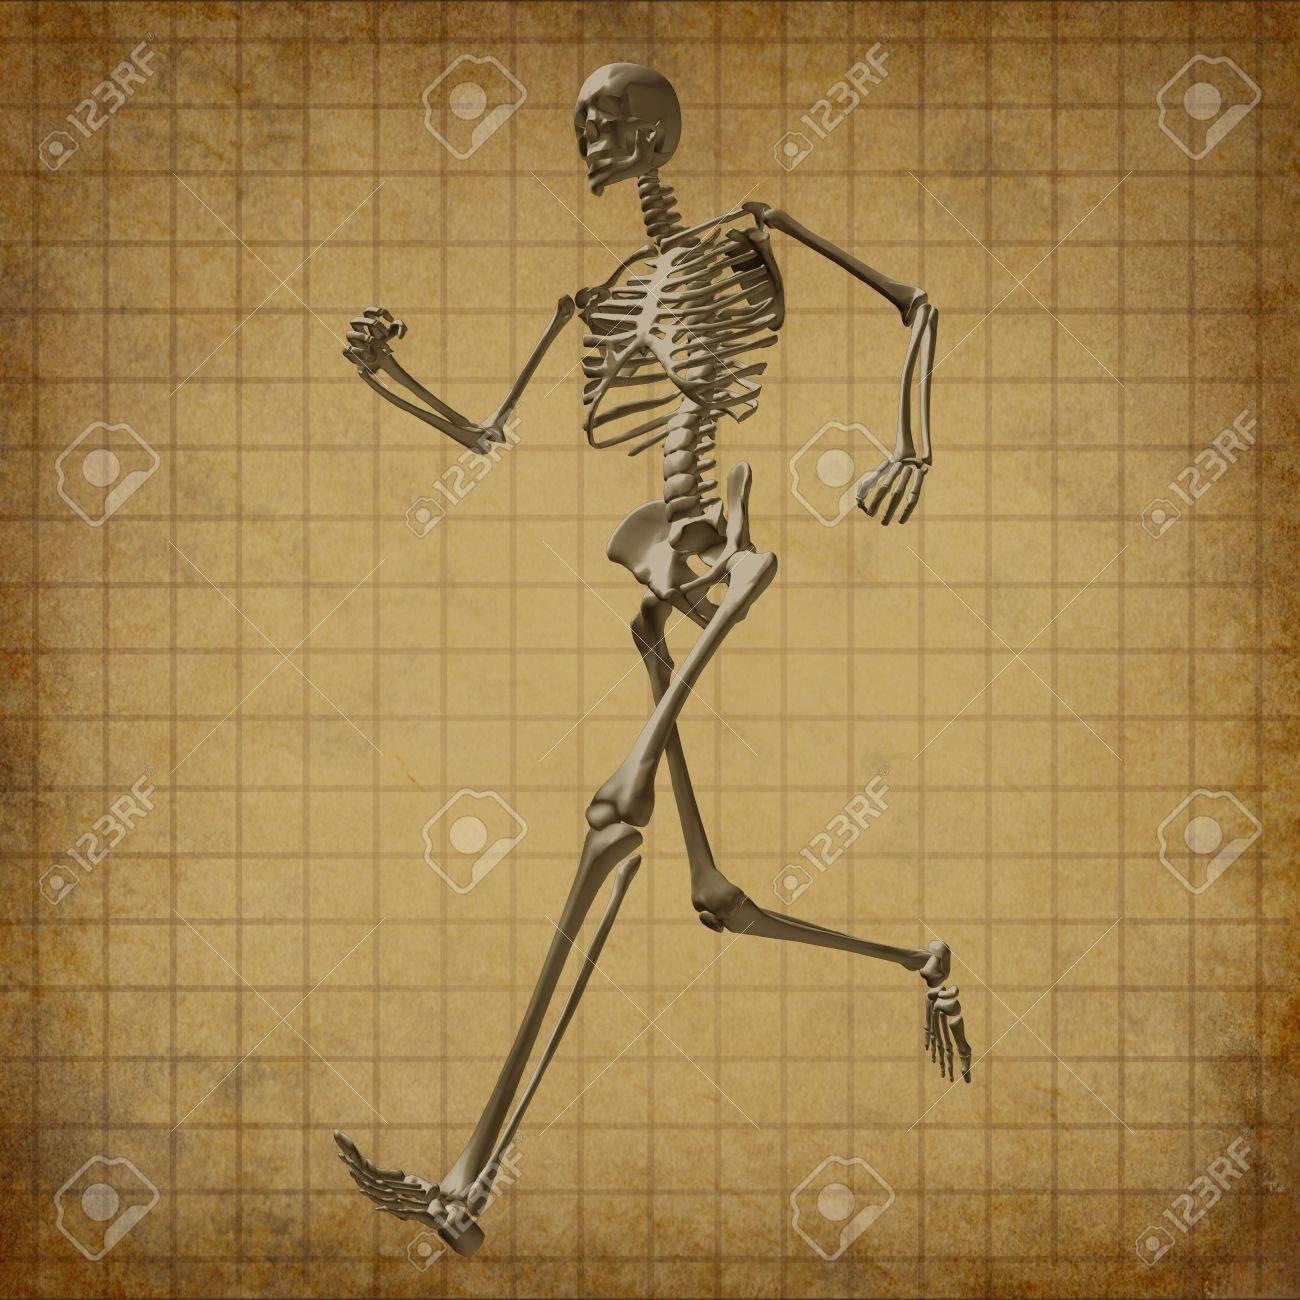 Skeleton running medical health care grunge old parchment document fitness bones symbol chart diagram Stock Photo - 11570650